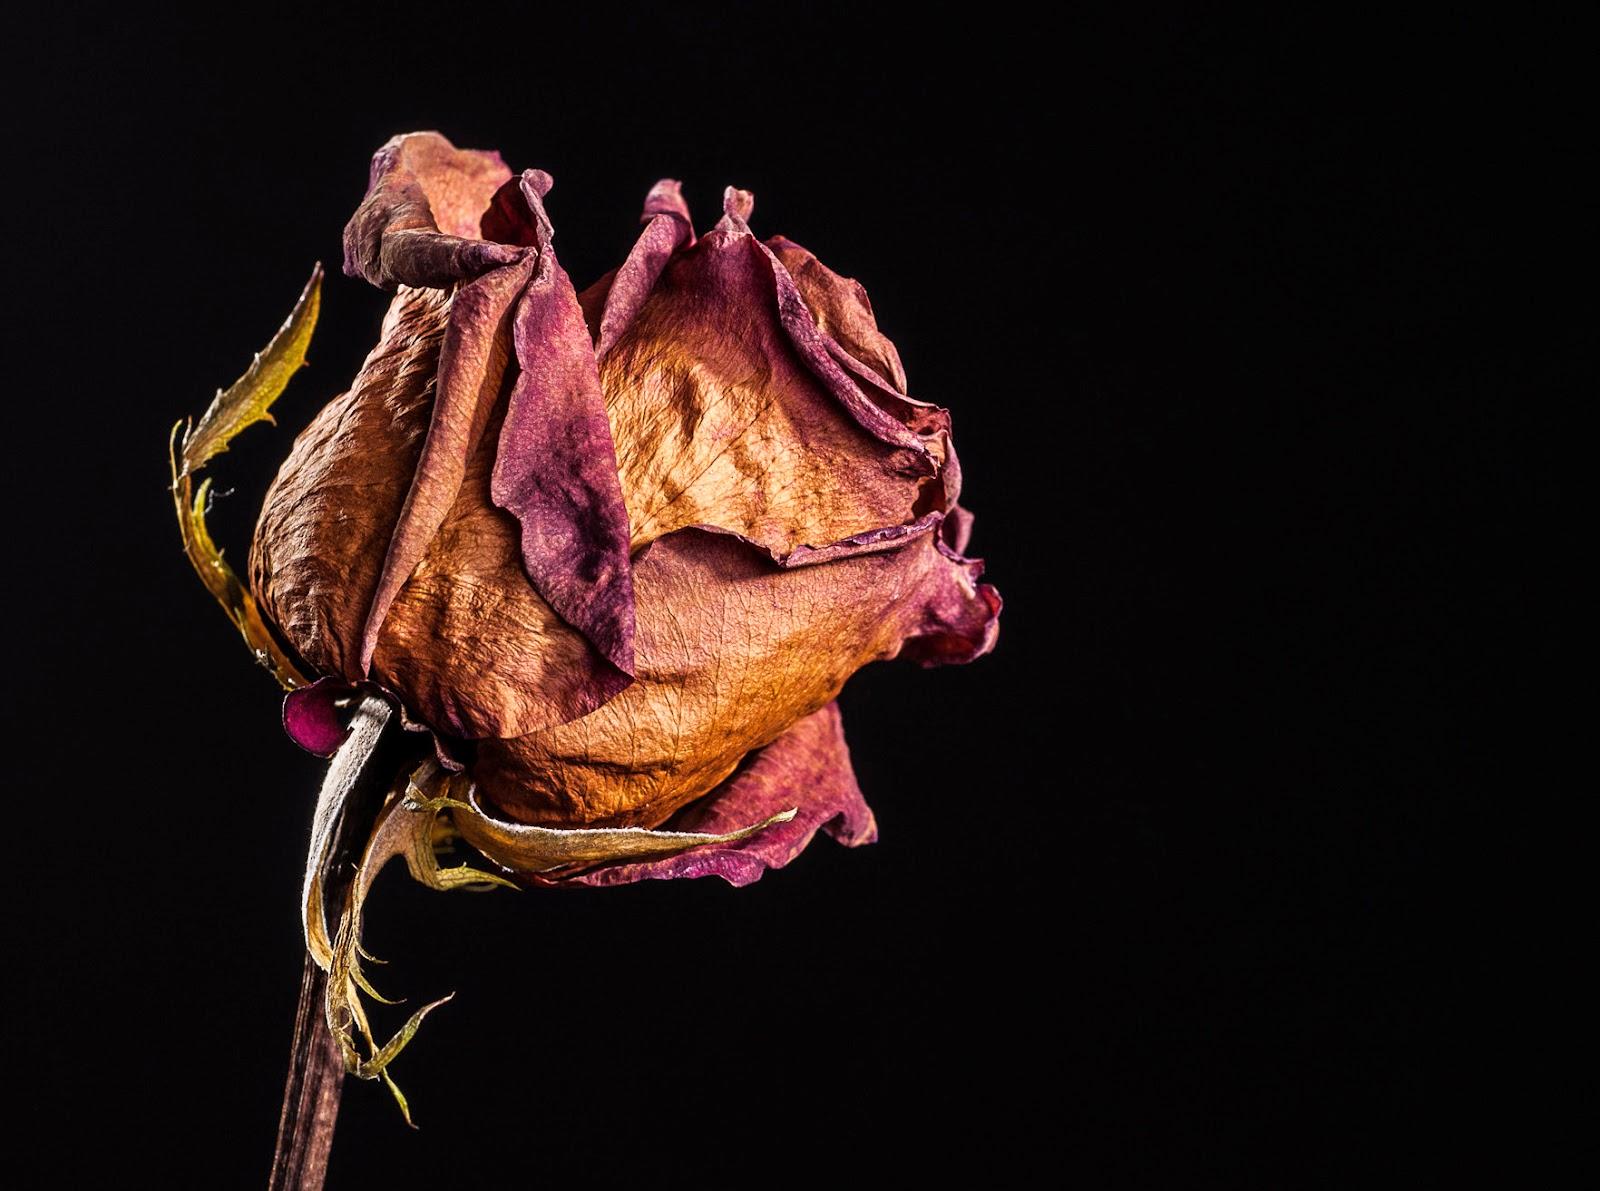 Imagenes de flores marchitas Imagenes tristes para  - Imagenes De Rosas Marchitas